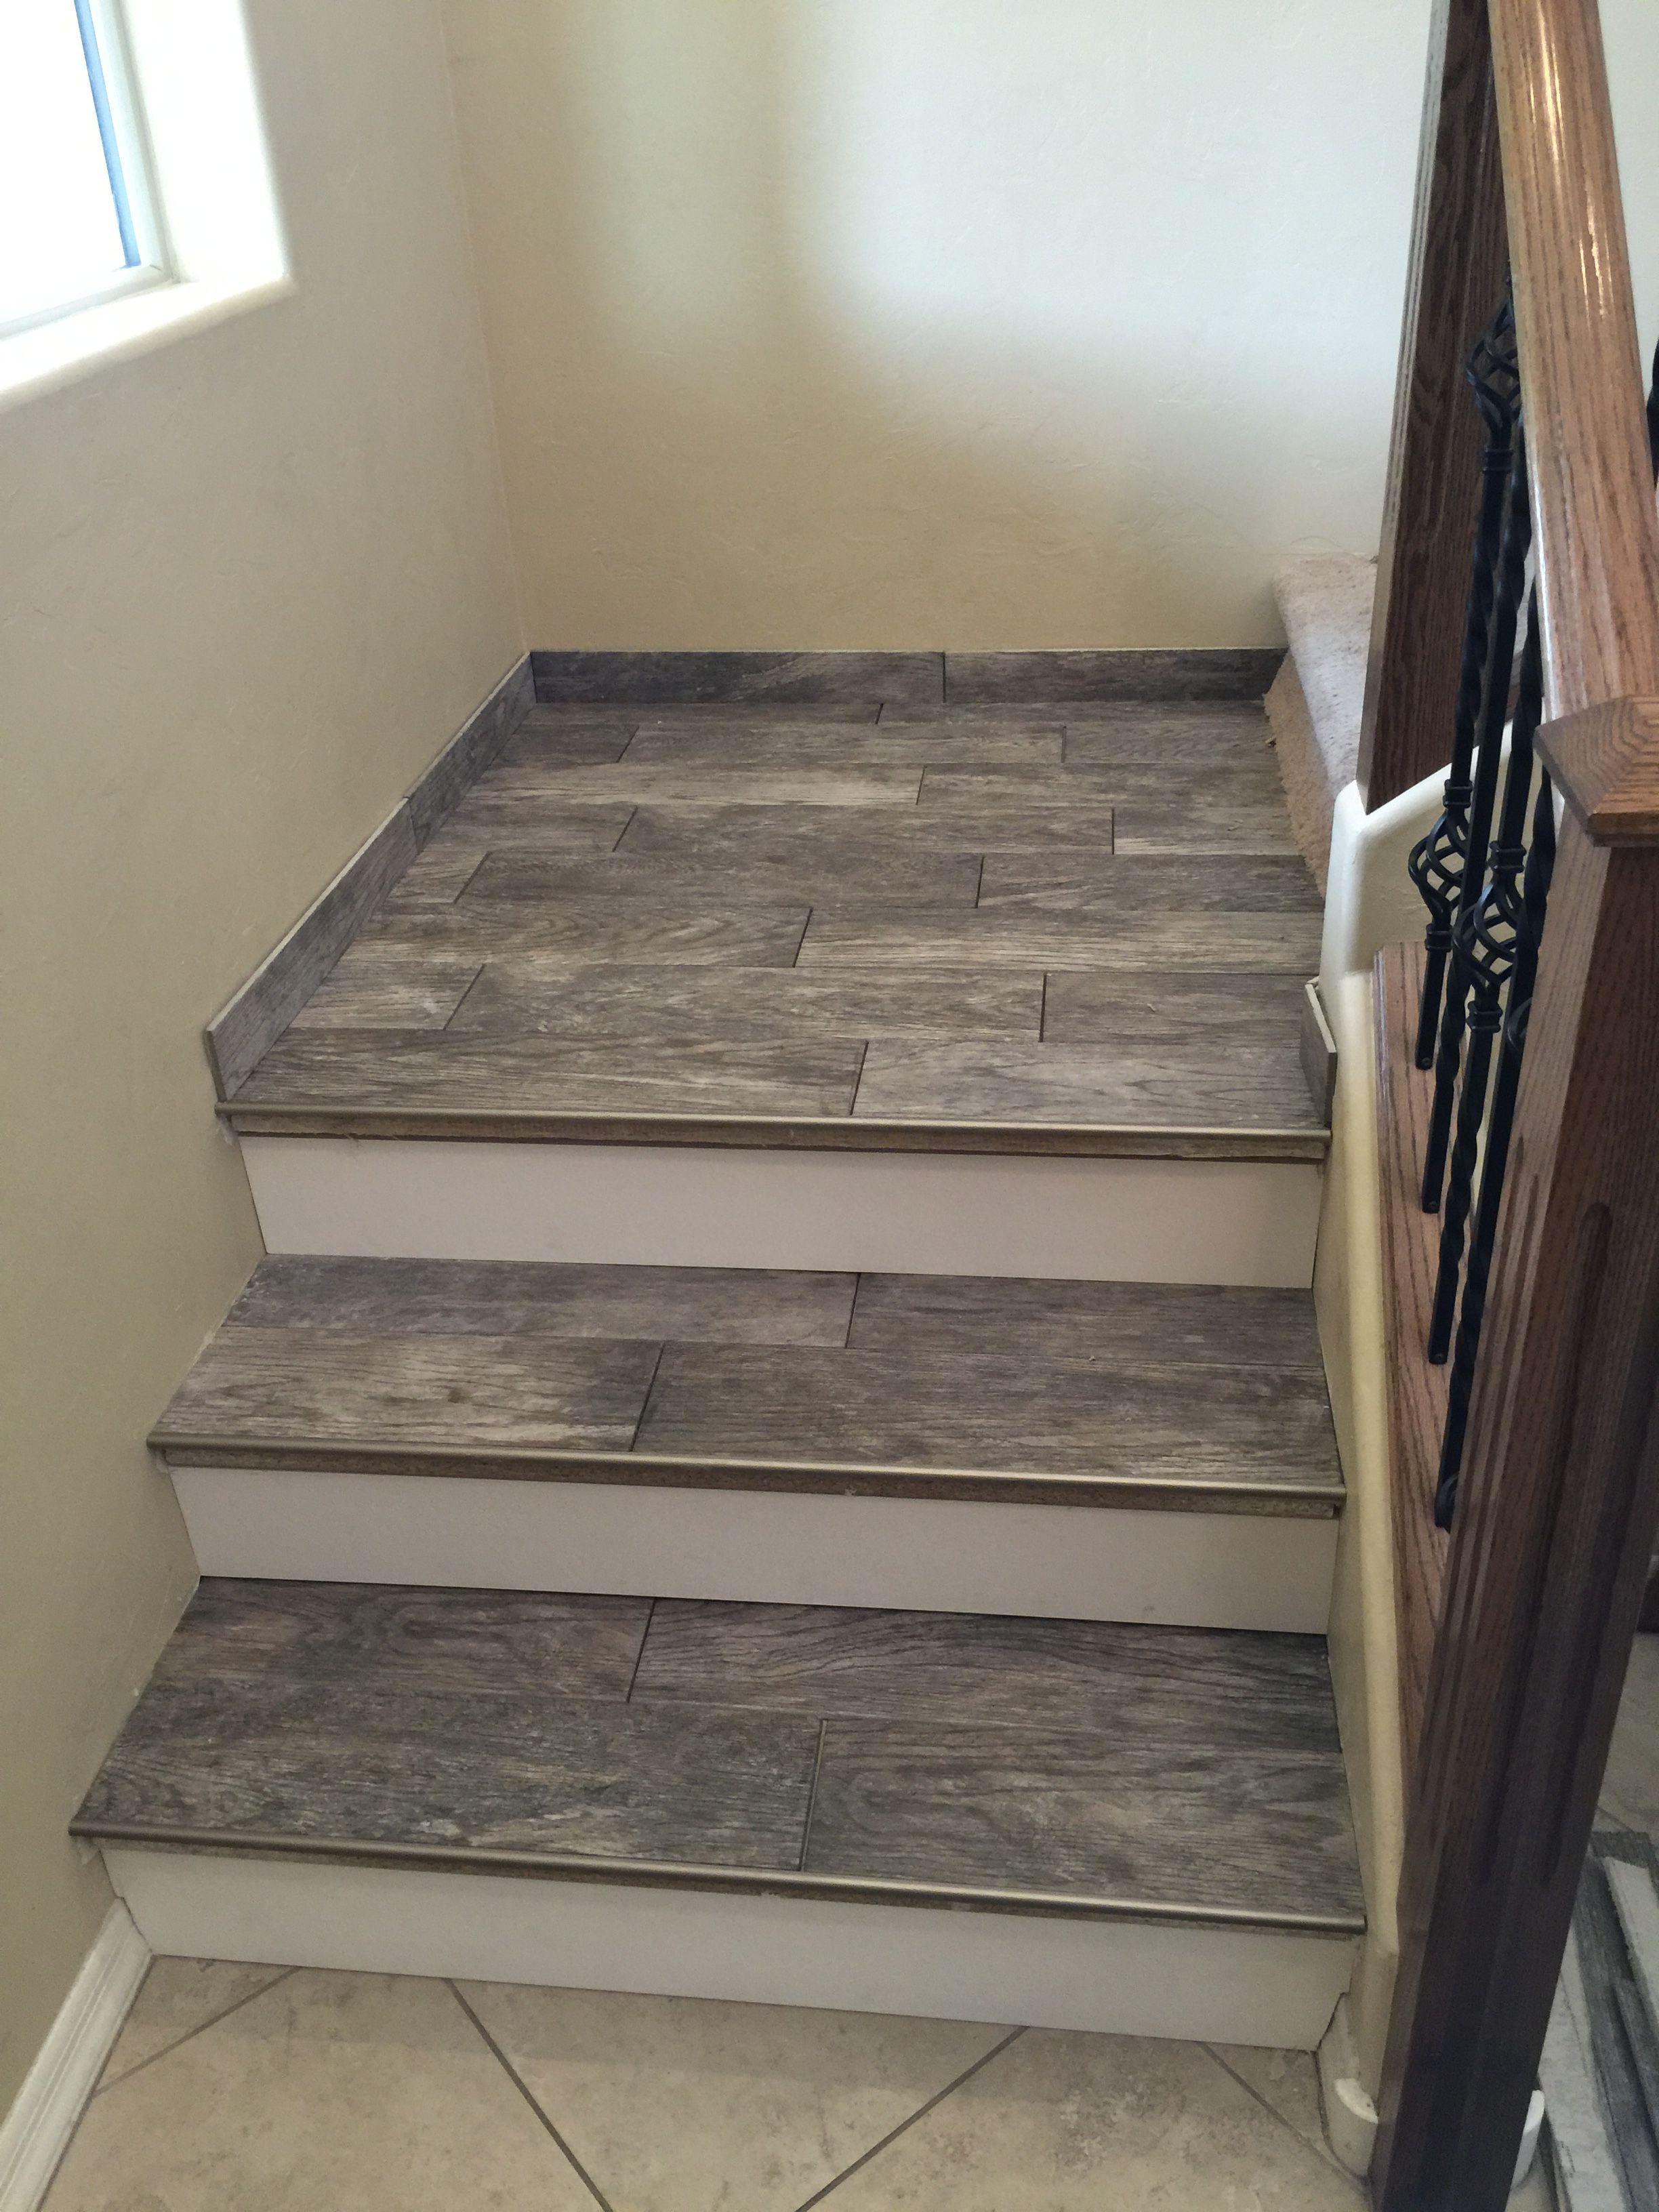 Porcelain wood look tile stairs Flooring for stairs, Diy